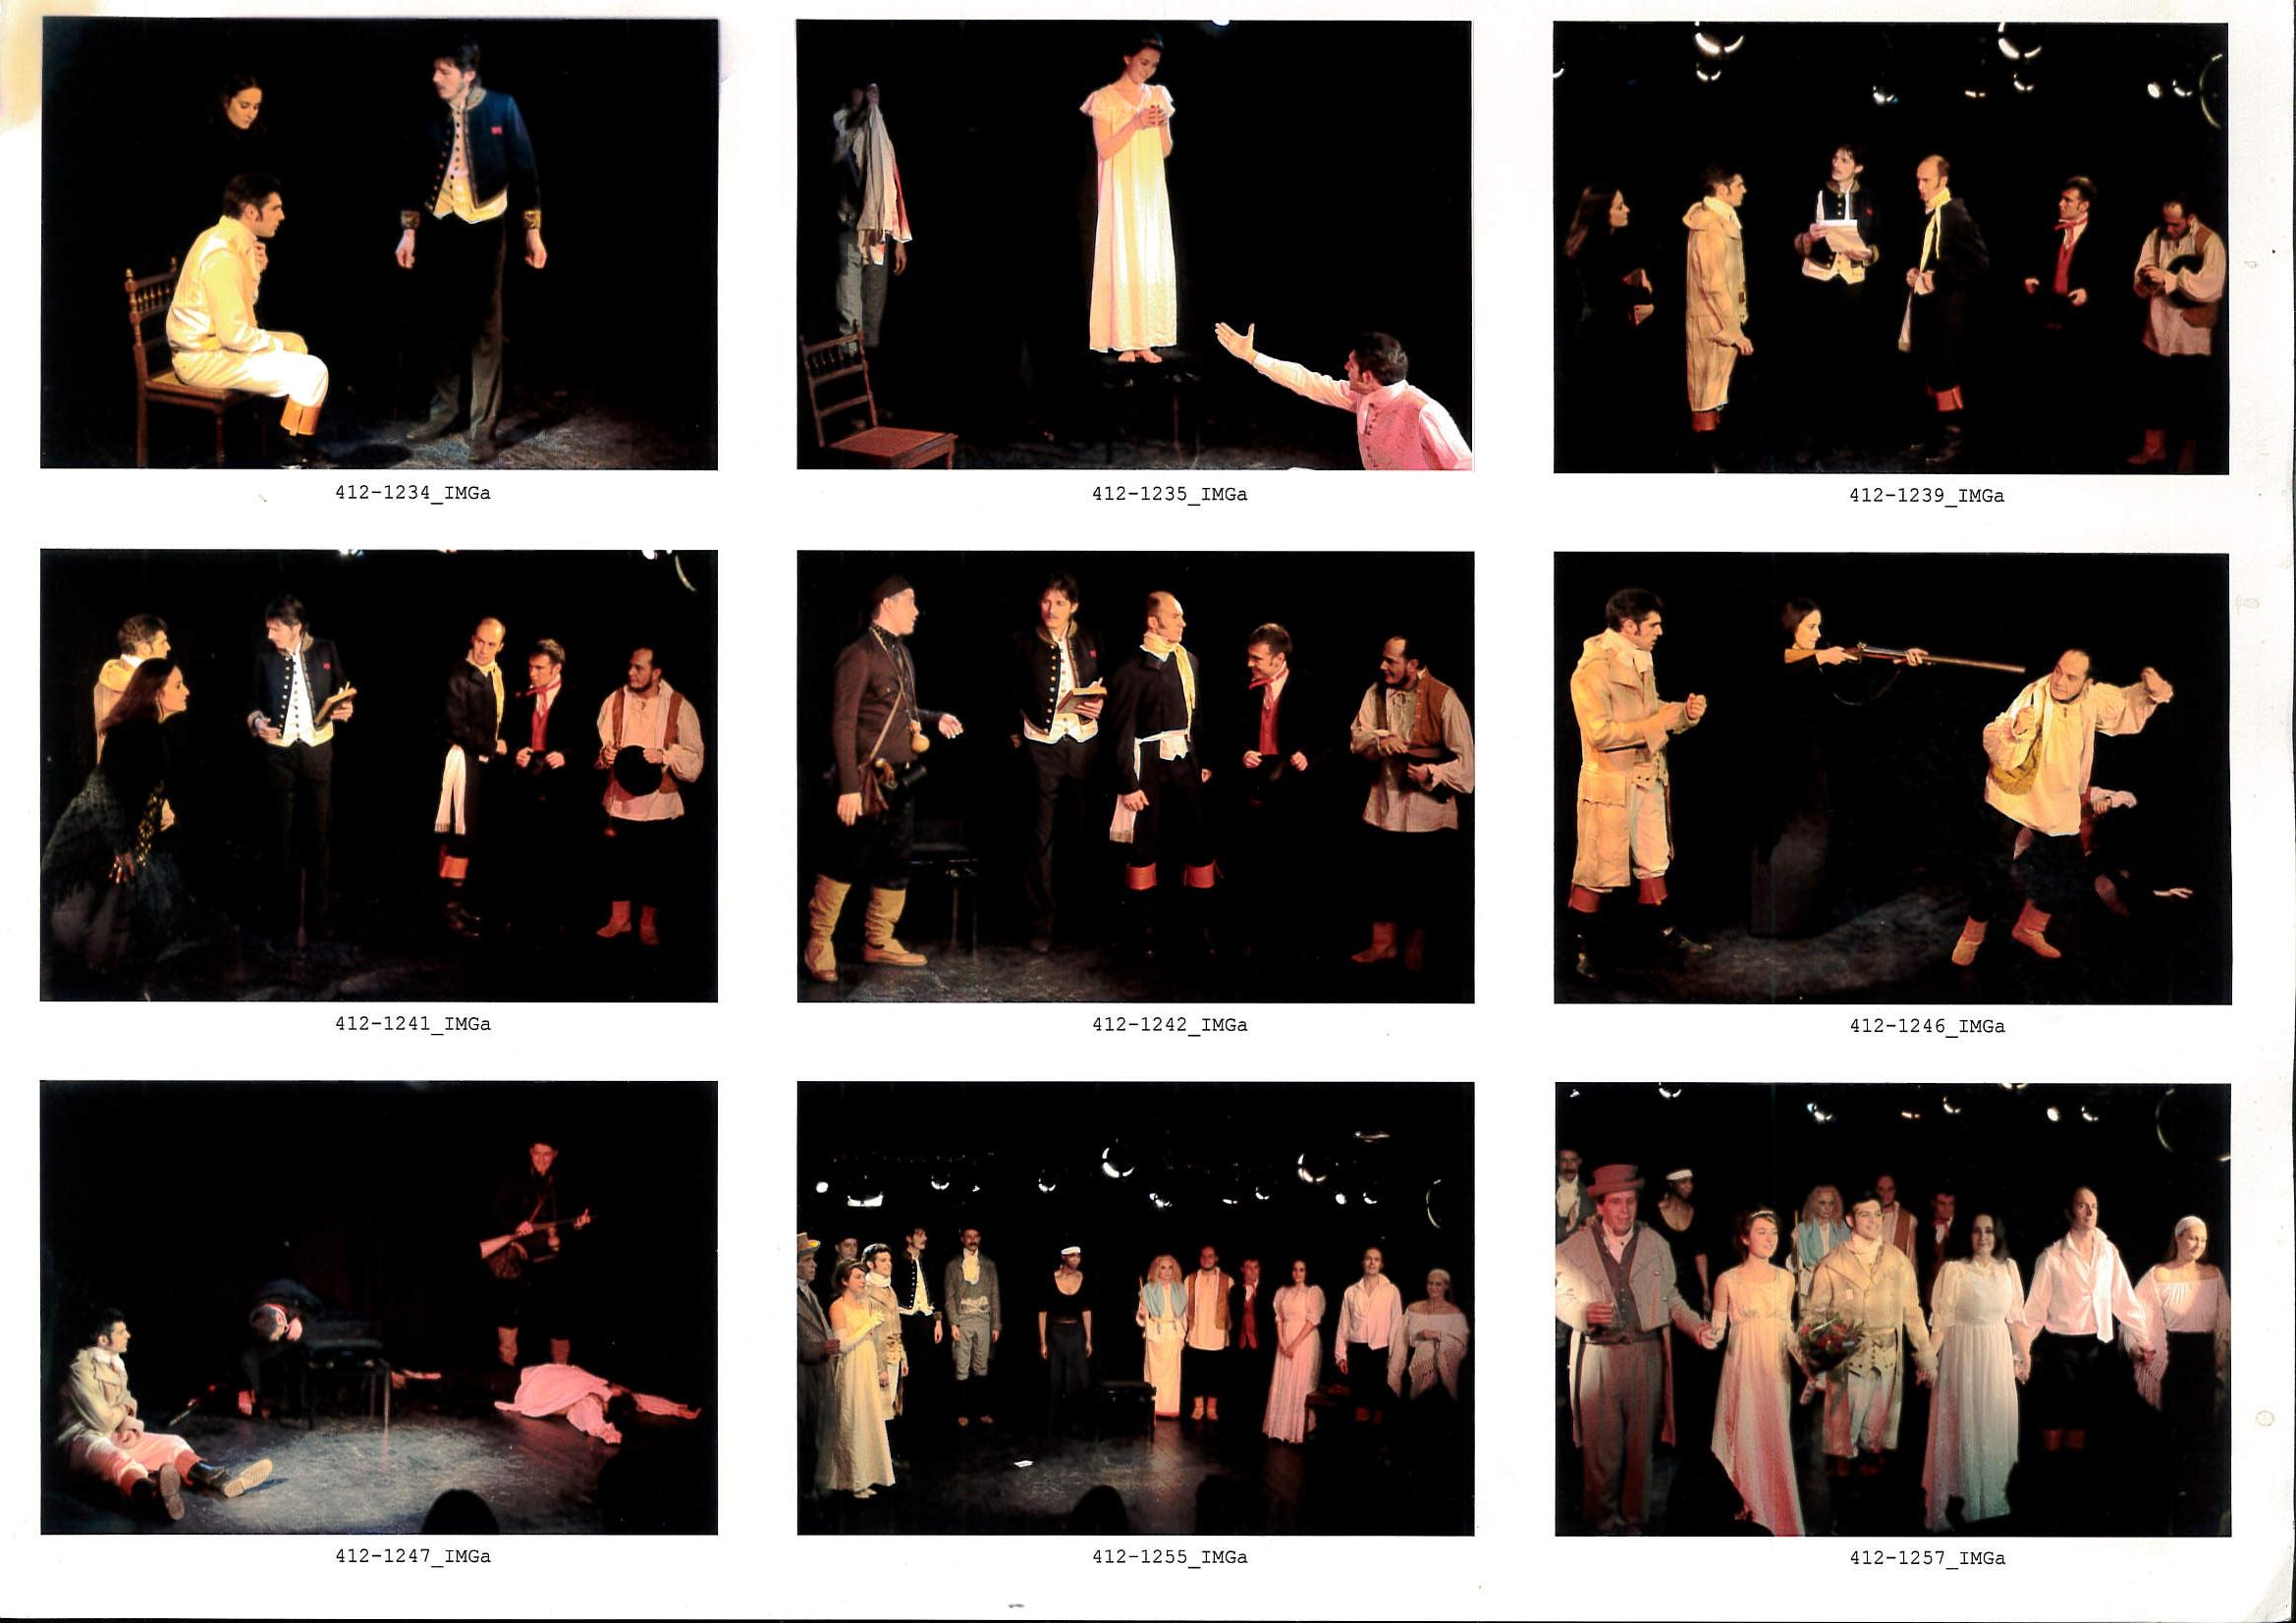 OWAP COLOMBA production Théâtre Darius Millaud Paris France Kim Michelle BRODERICK Director Producer .jpg